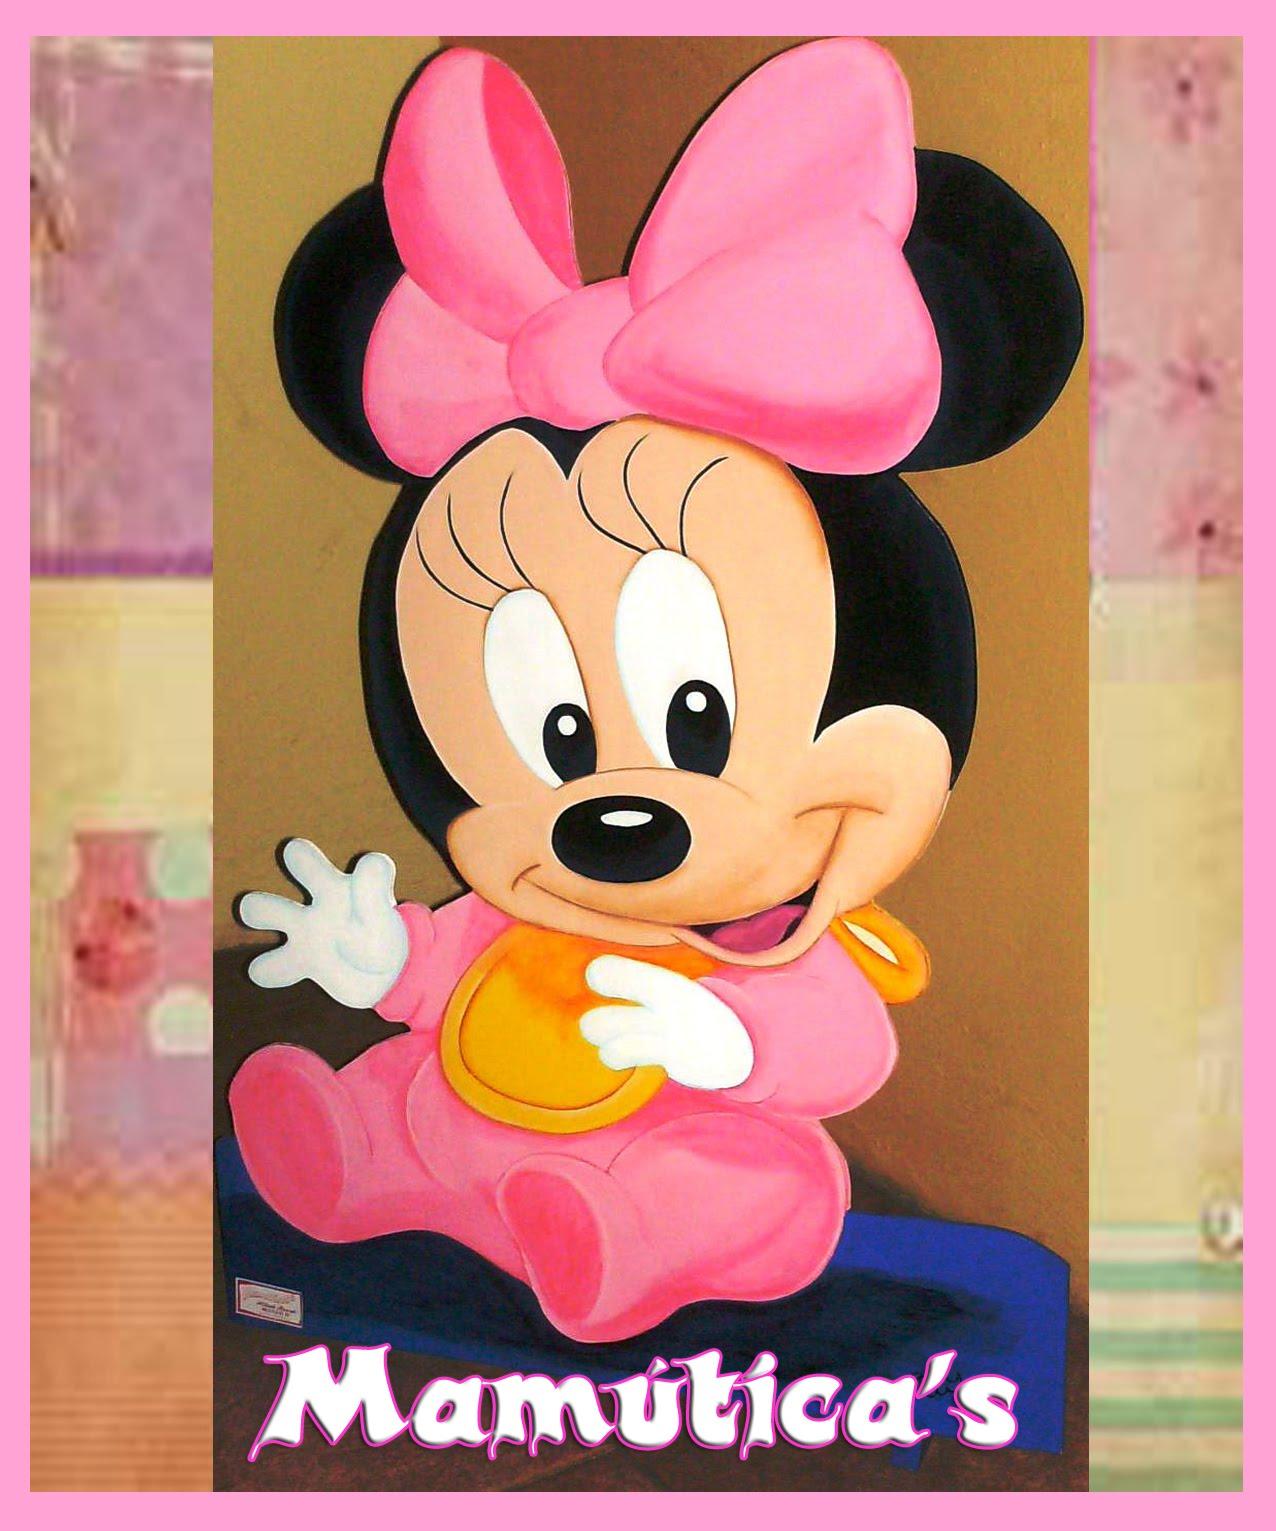 Mamutica's: Baby Minnie